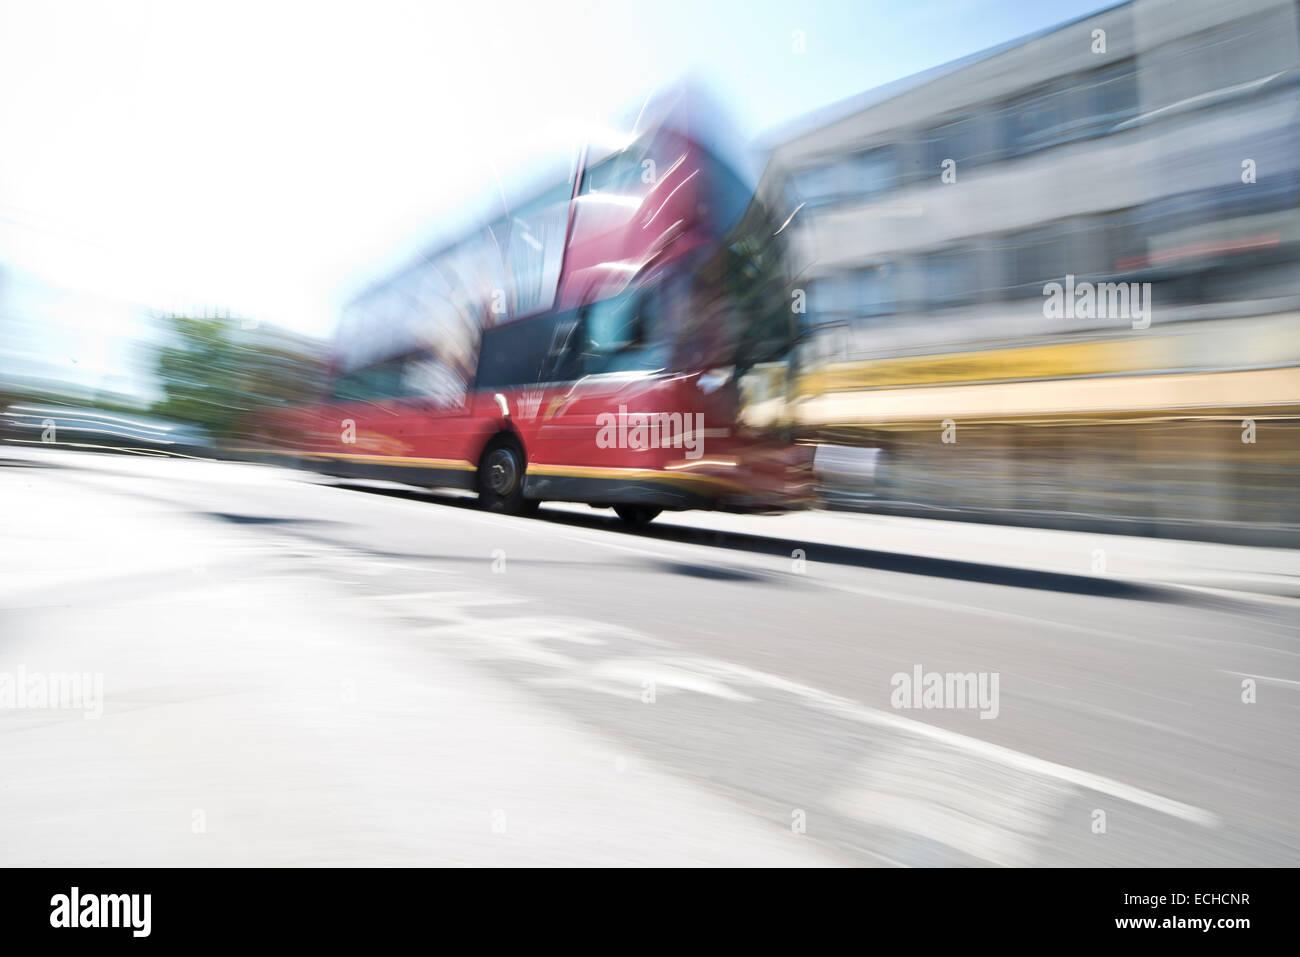 London bus motion blur - Stock Image